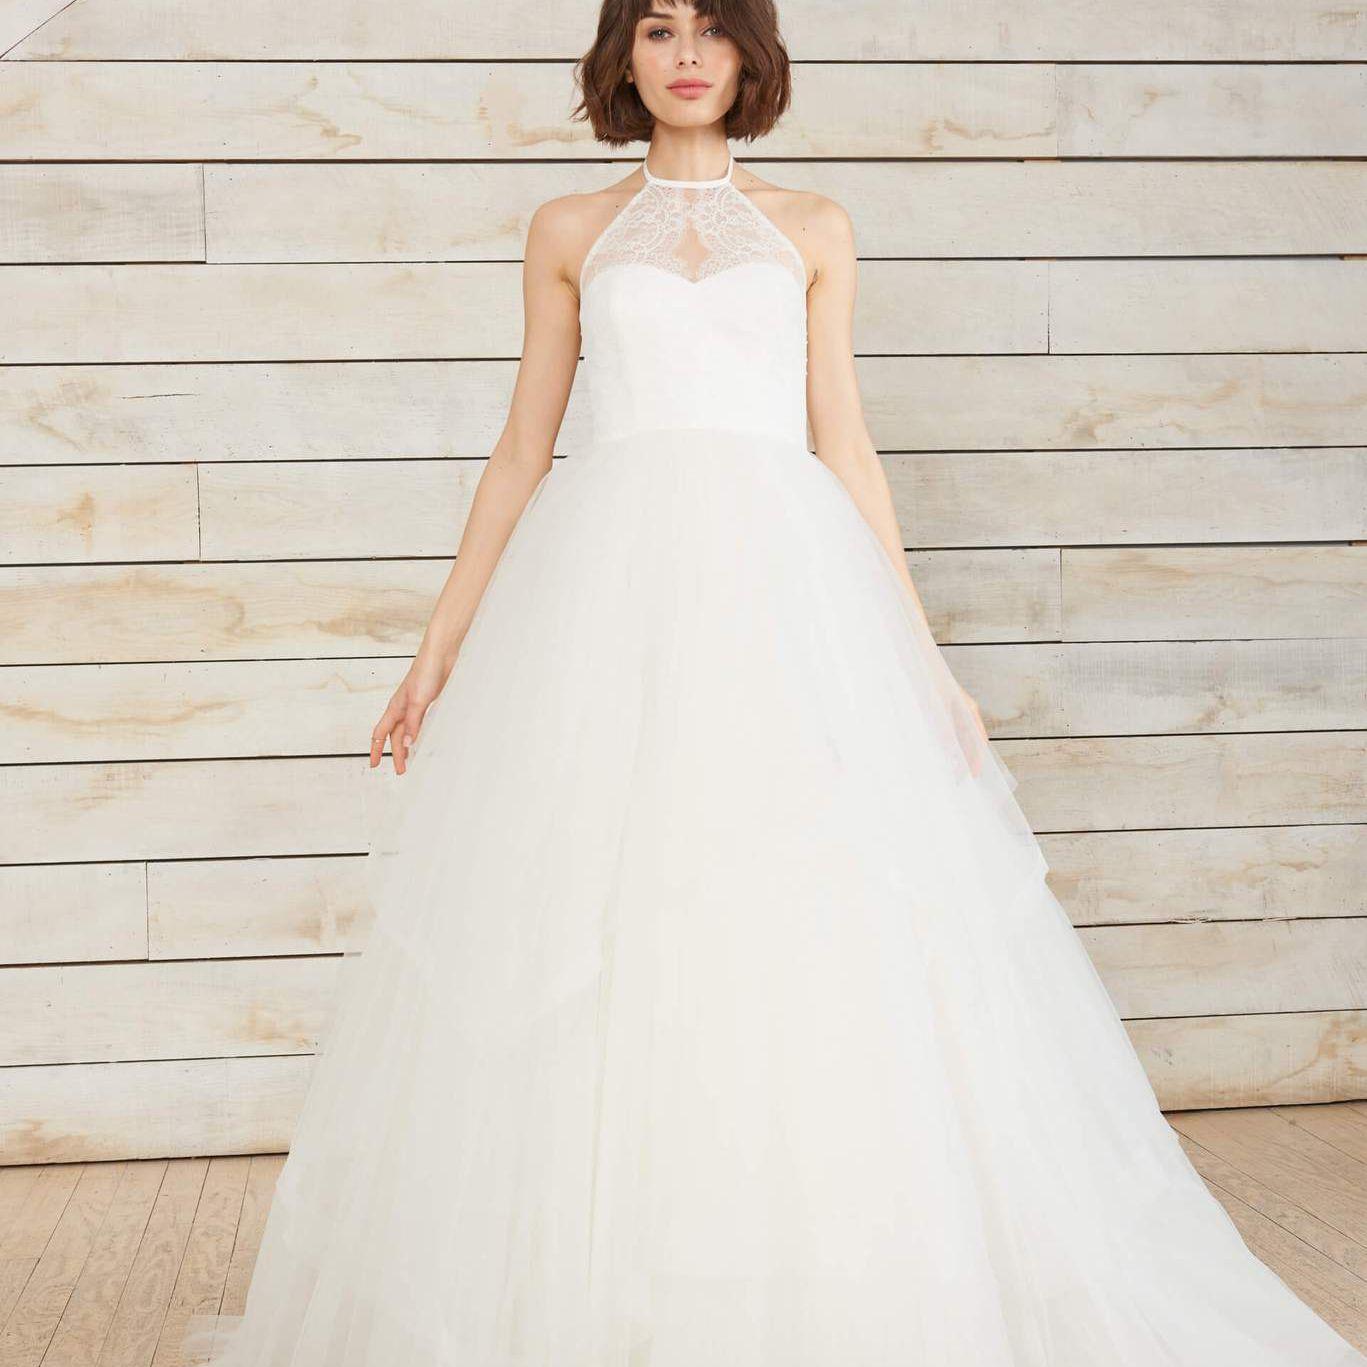 Sleeveless wedding gown